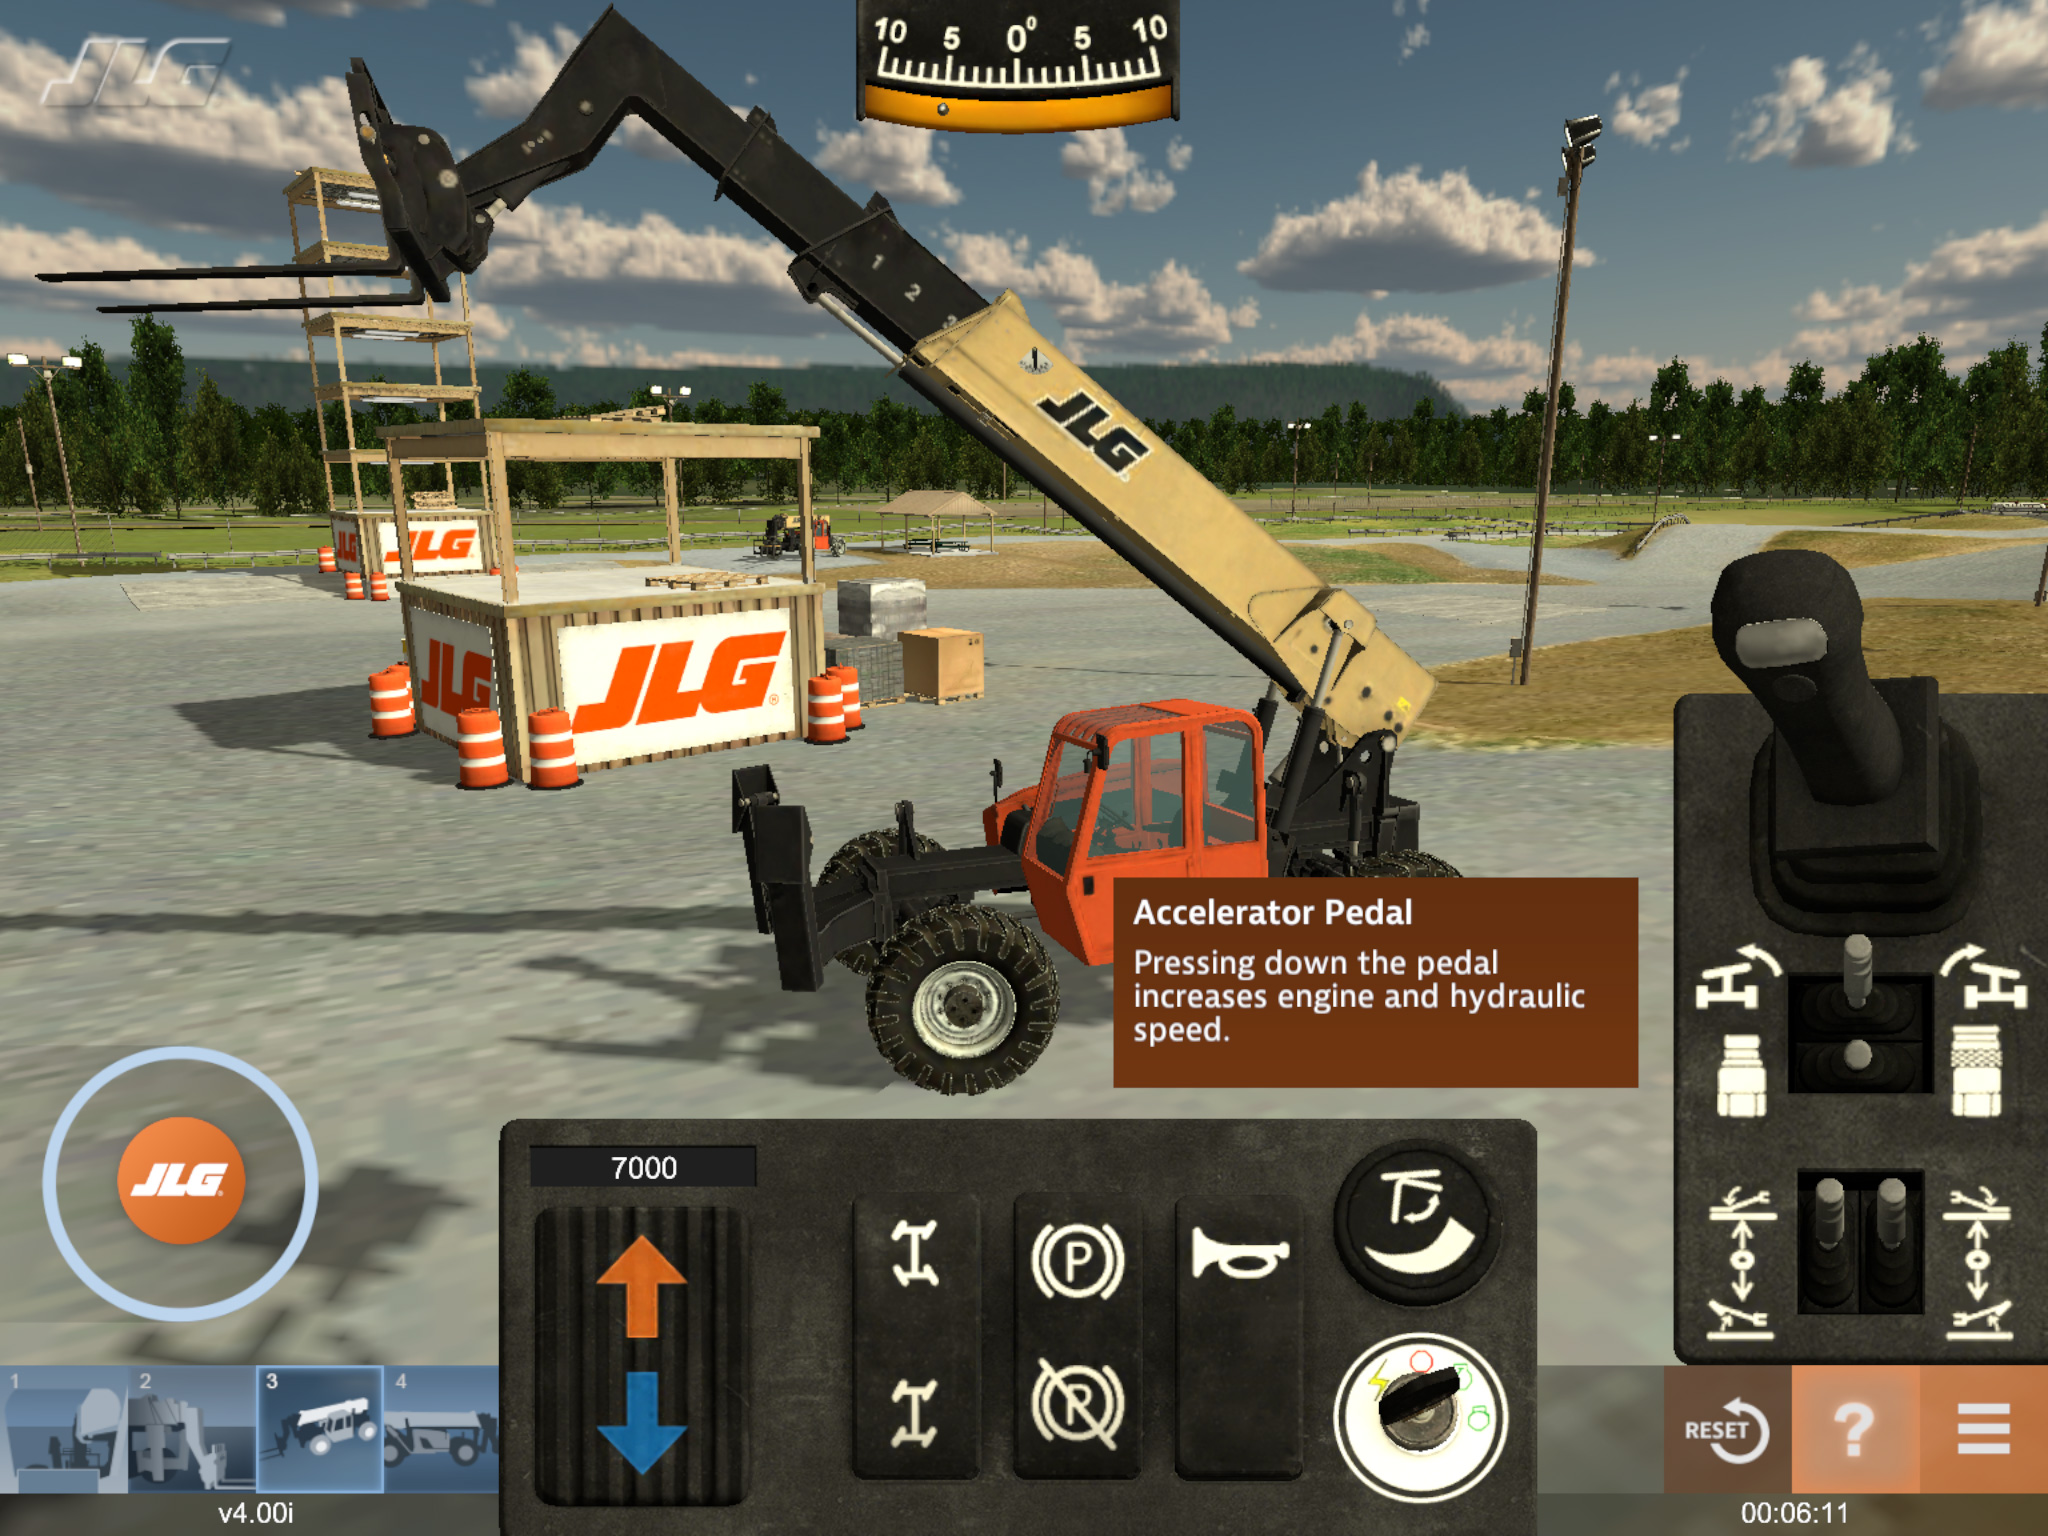 JLG Industries Telehandler Operator Training Simulator by ForgeFX Simulations